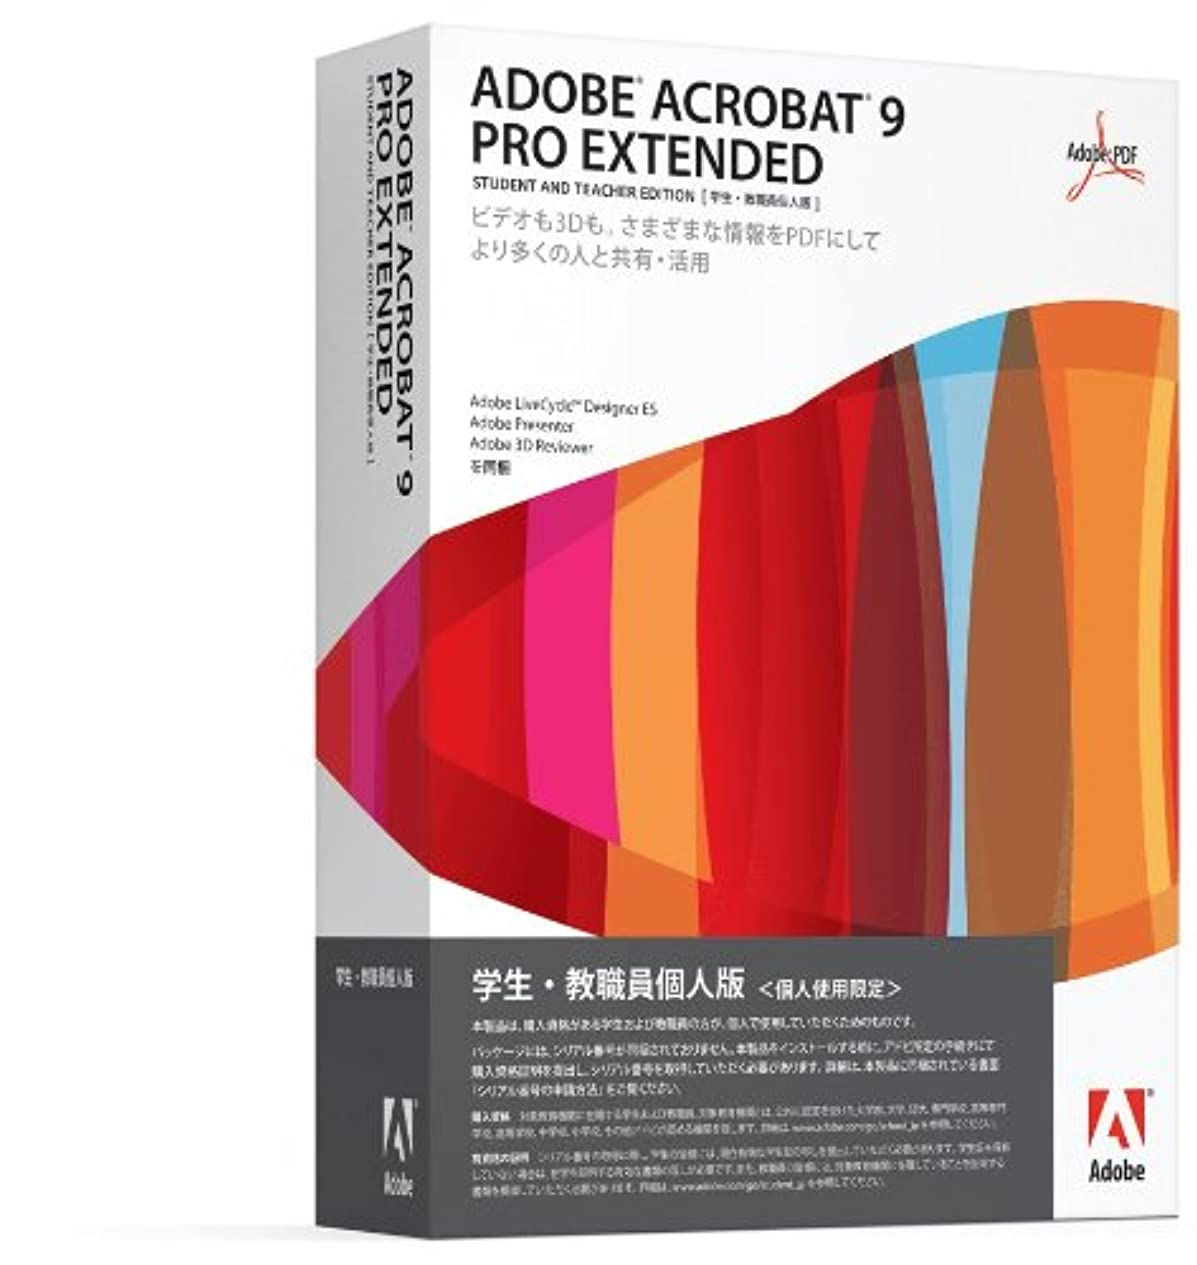 九飛躍スケート学生?教職員個人版 Adobe Acrobat Pro Extended 9.0 日本語版 Windows版 (要シリアル番号申請)